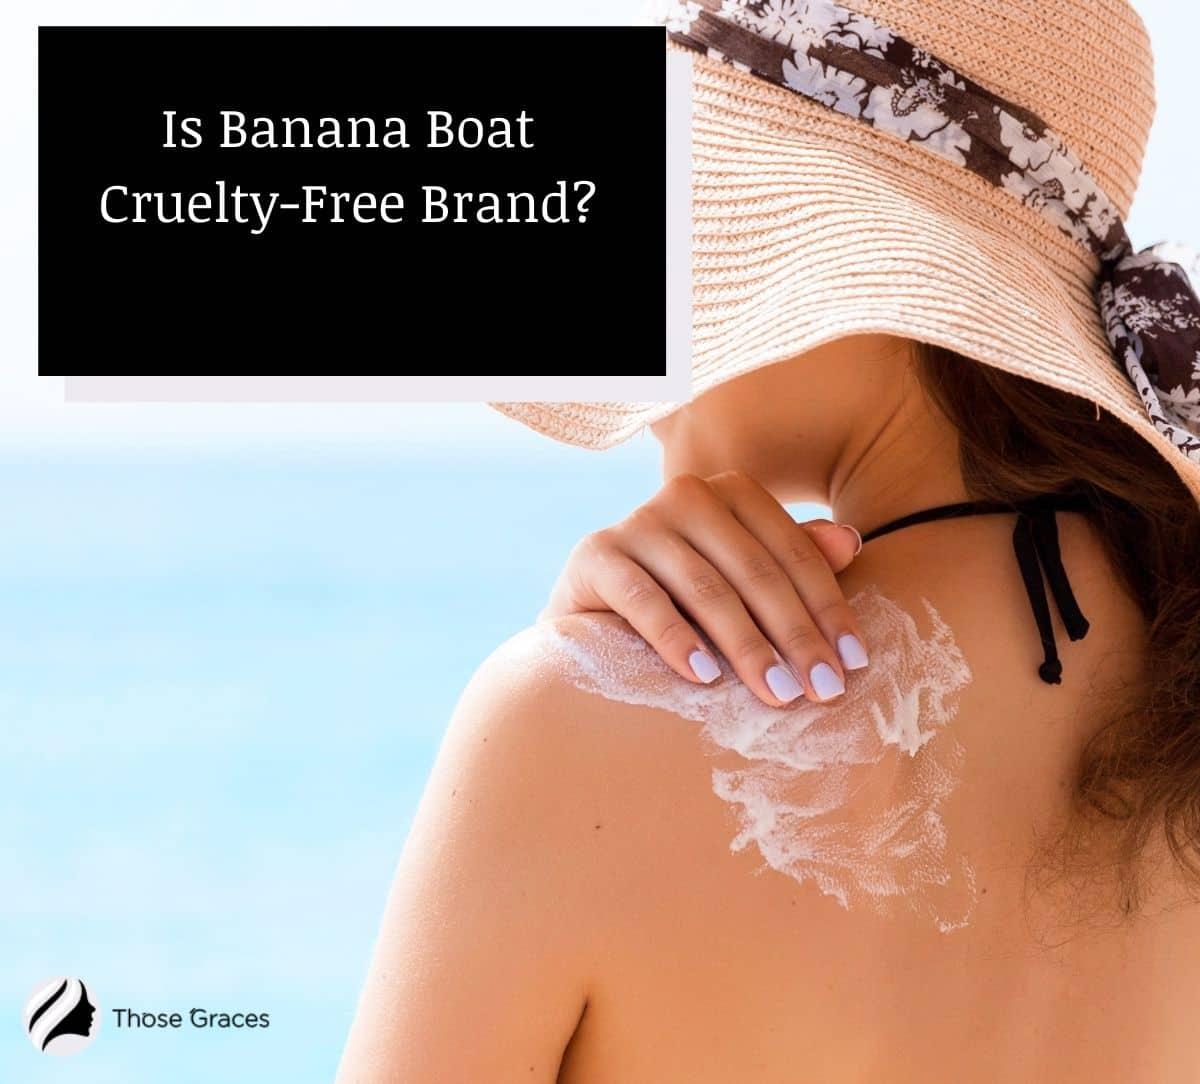 woman putting Banana boat sunscreen at her back